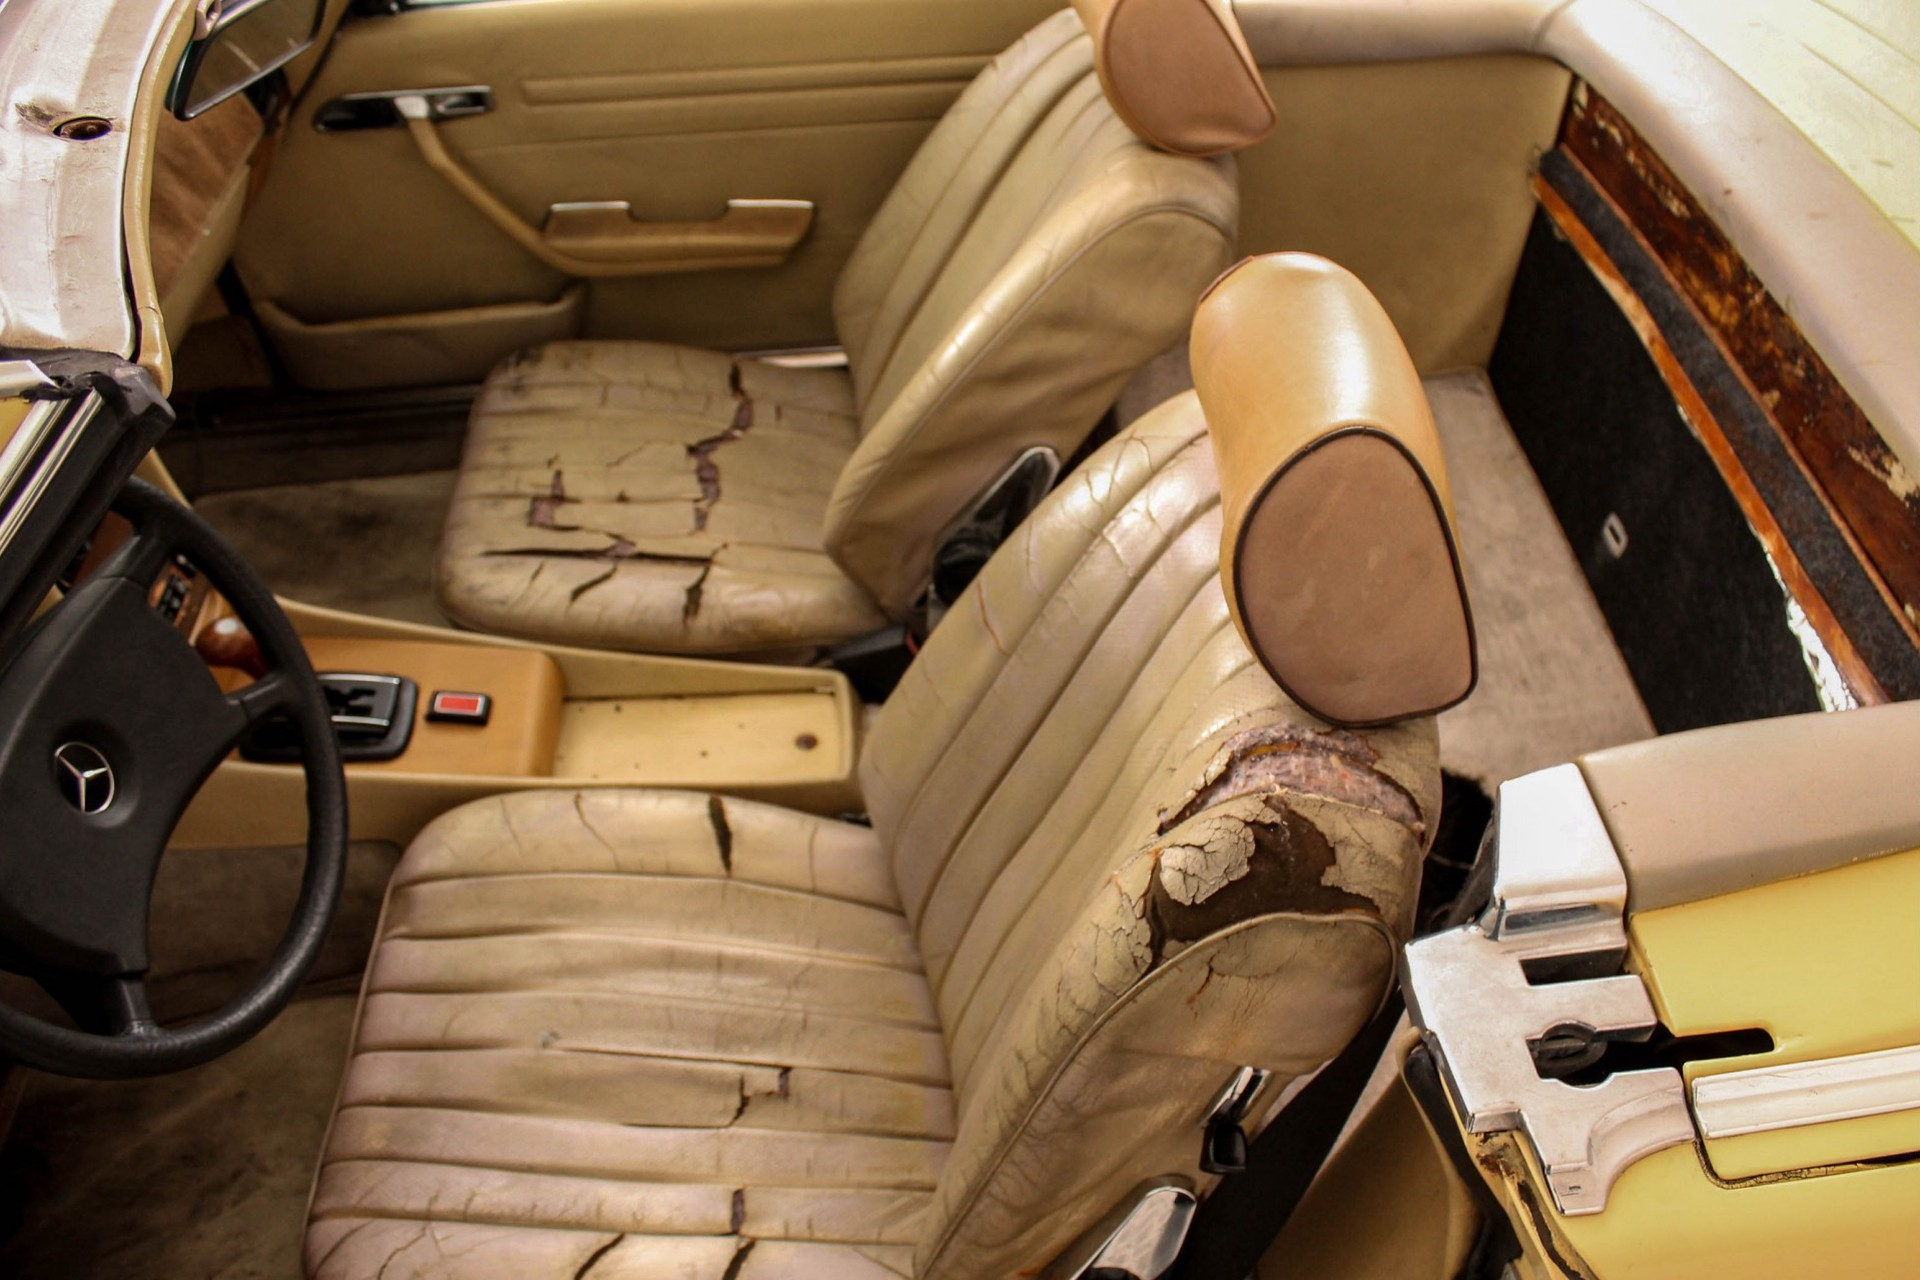 Mercedes-Benz SL-Klasse Roadster 380 SL Foto 11